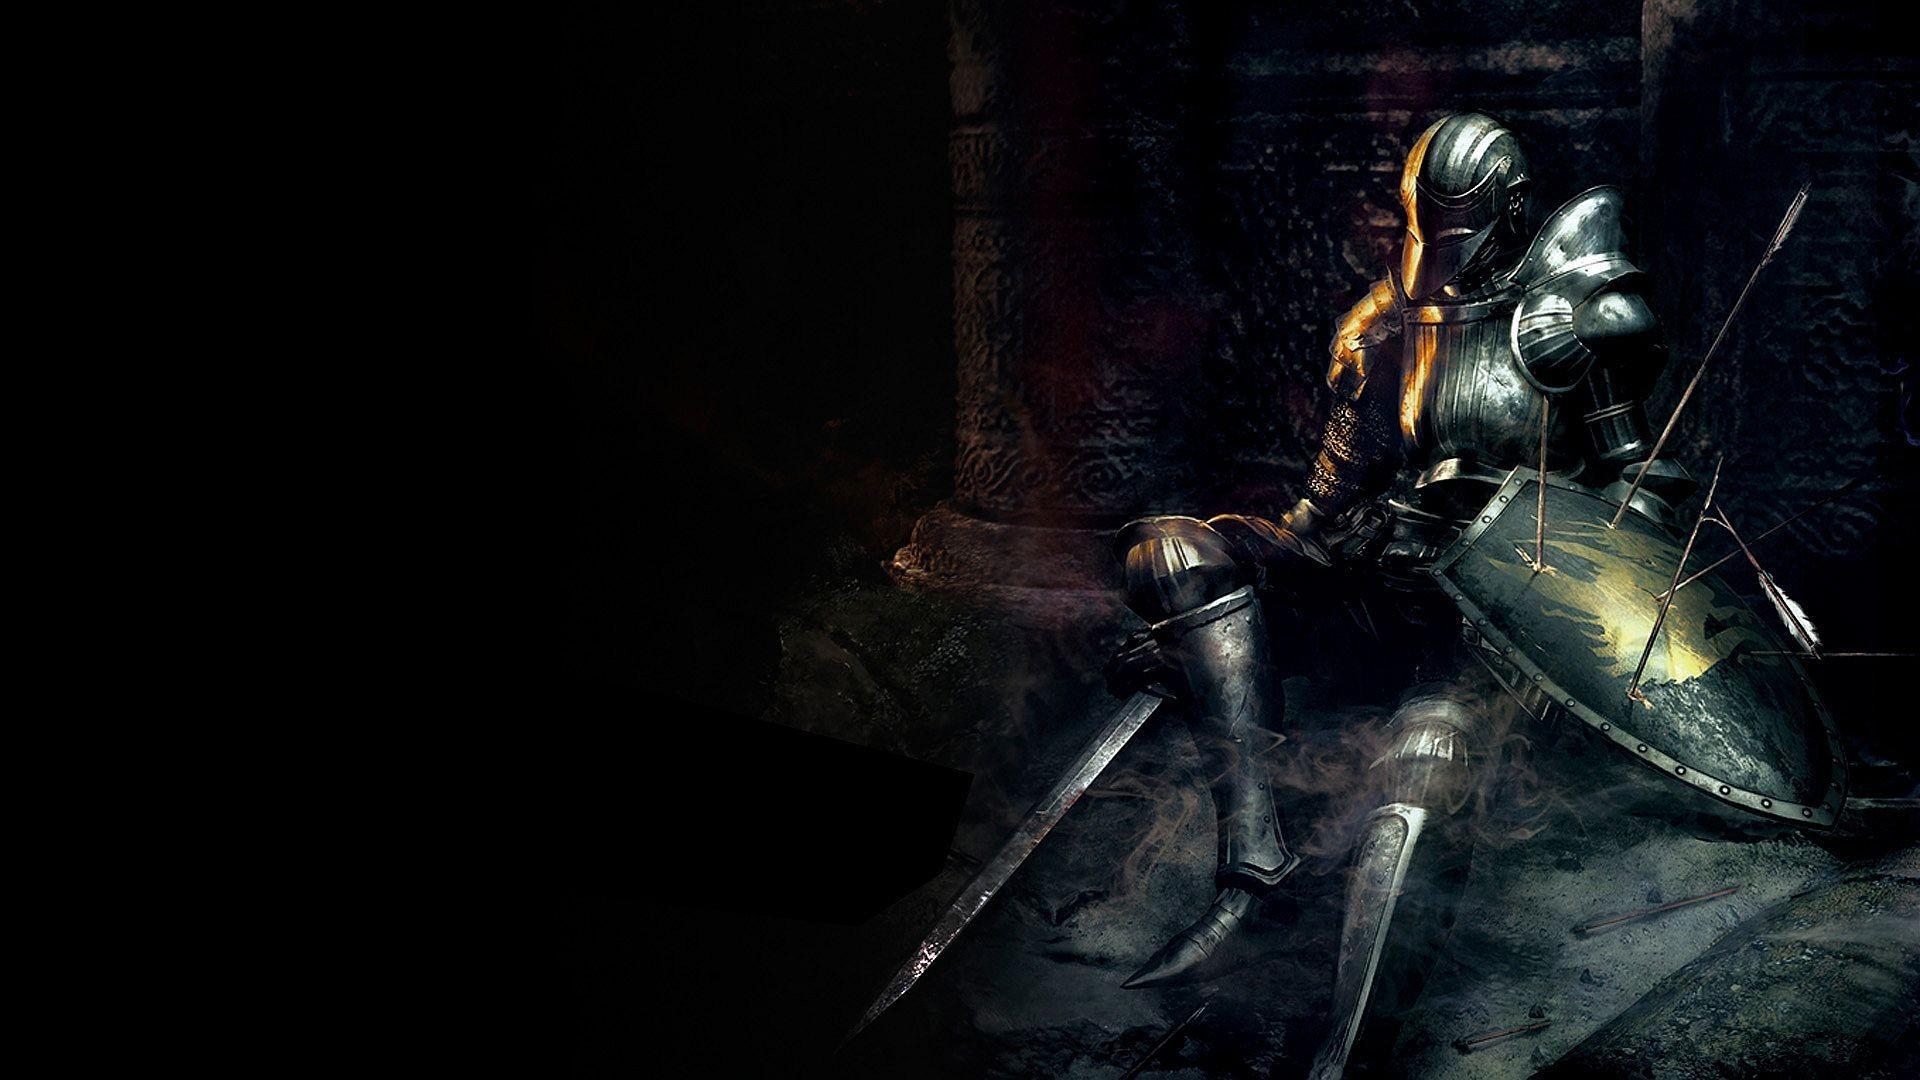 DEEP DOWN fantasy rpg dungeon crawler medieval fighting sci-fi .